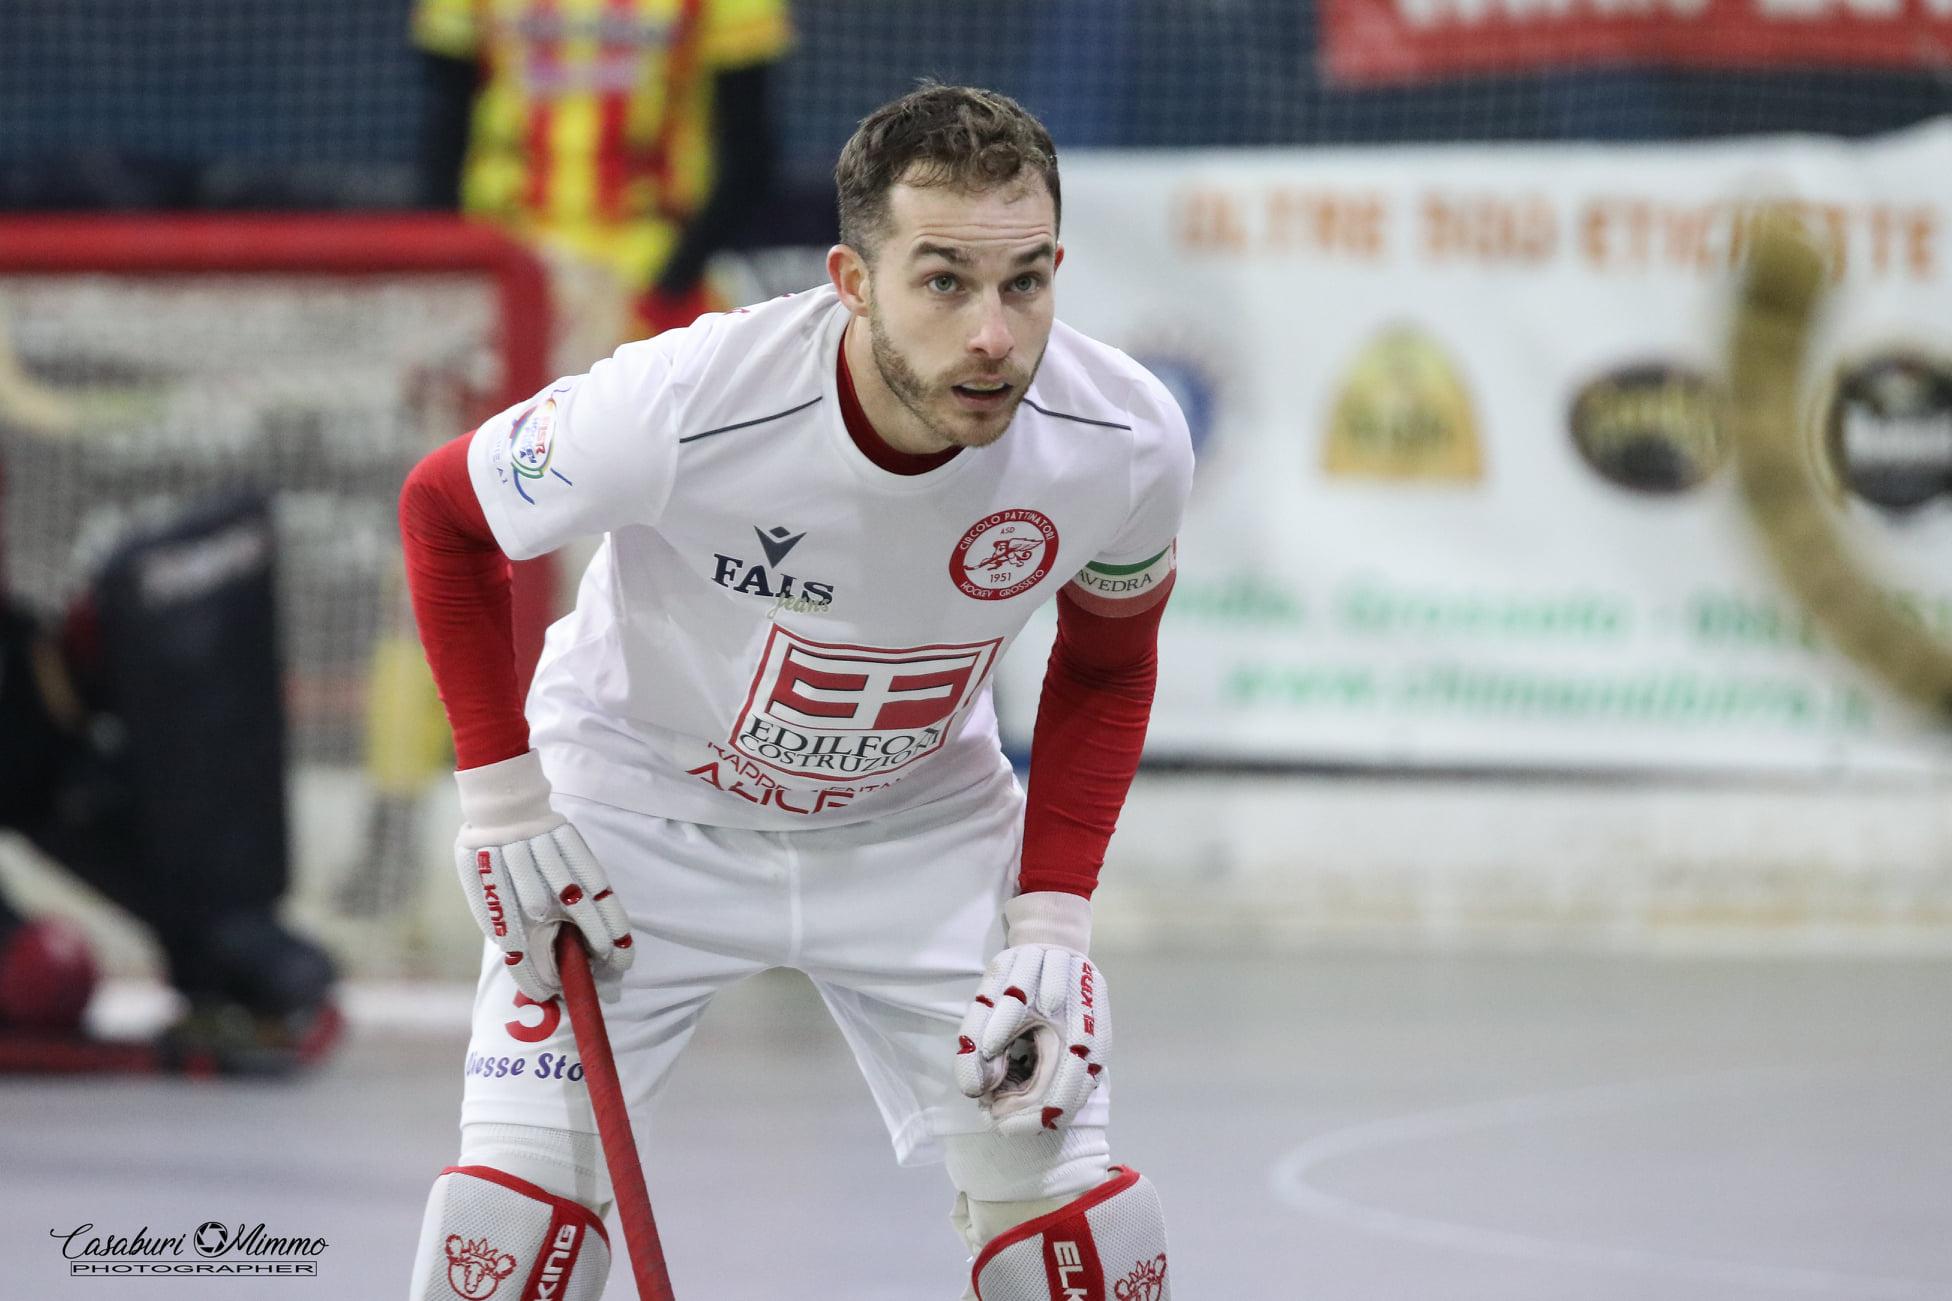 hockey-pista-serie-A-circolo-pattinatori-grosseto-partita-Edilfox-Bassano-giocatore-Saavedra